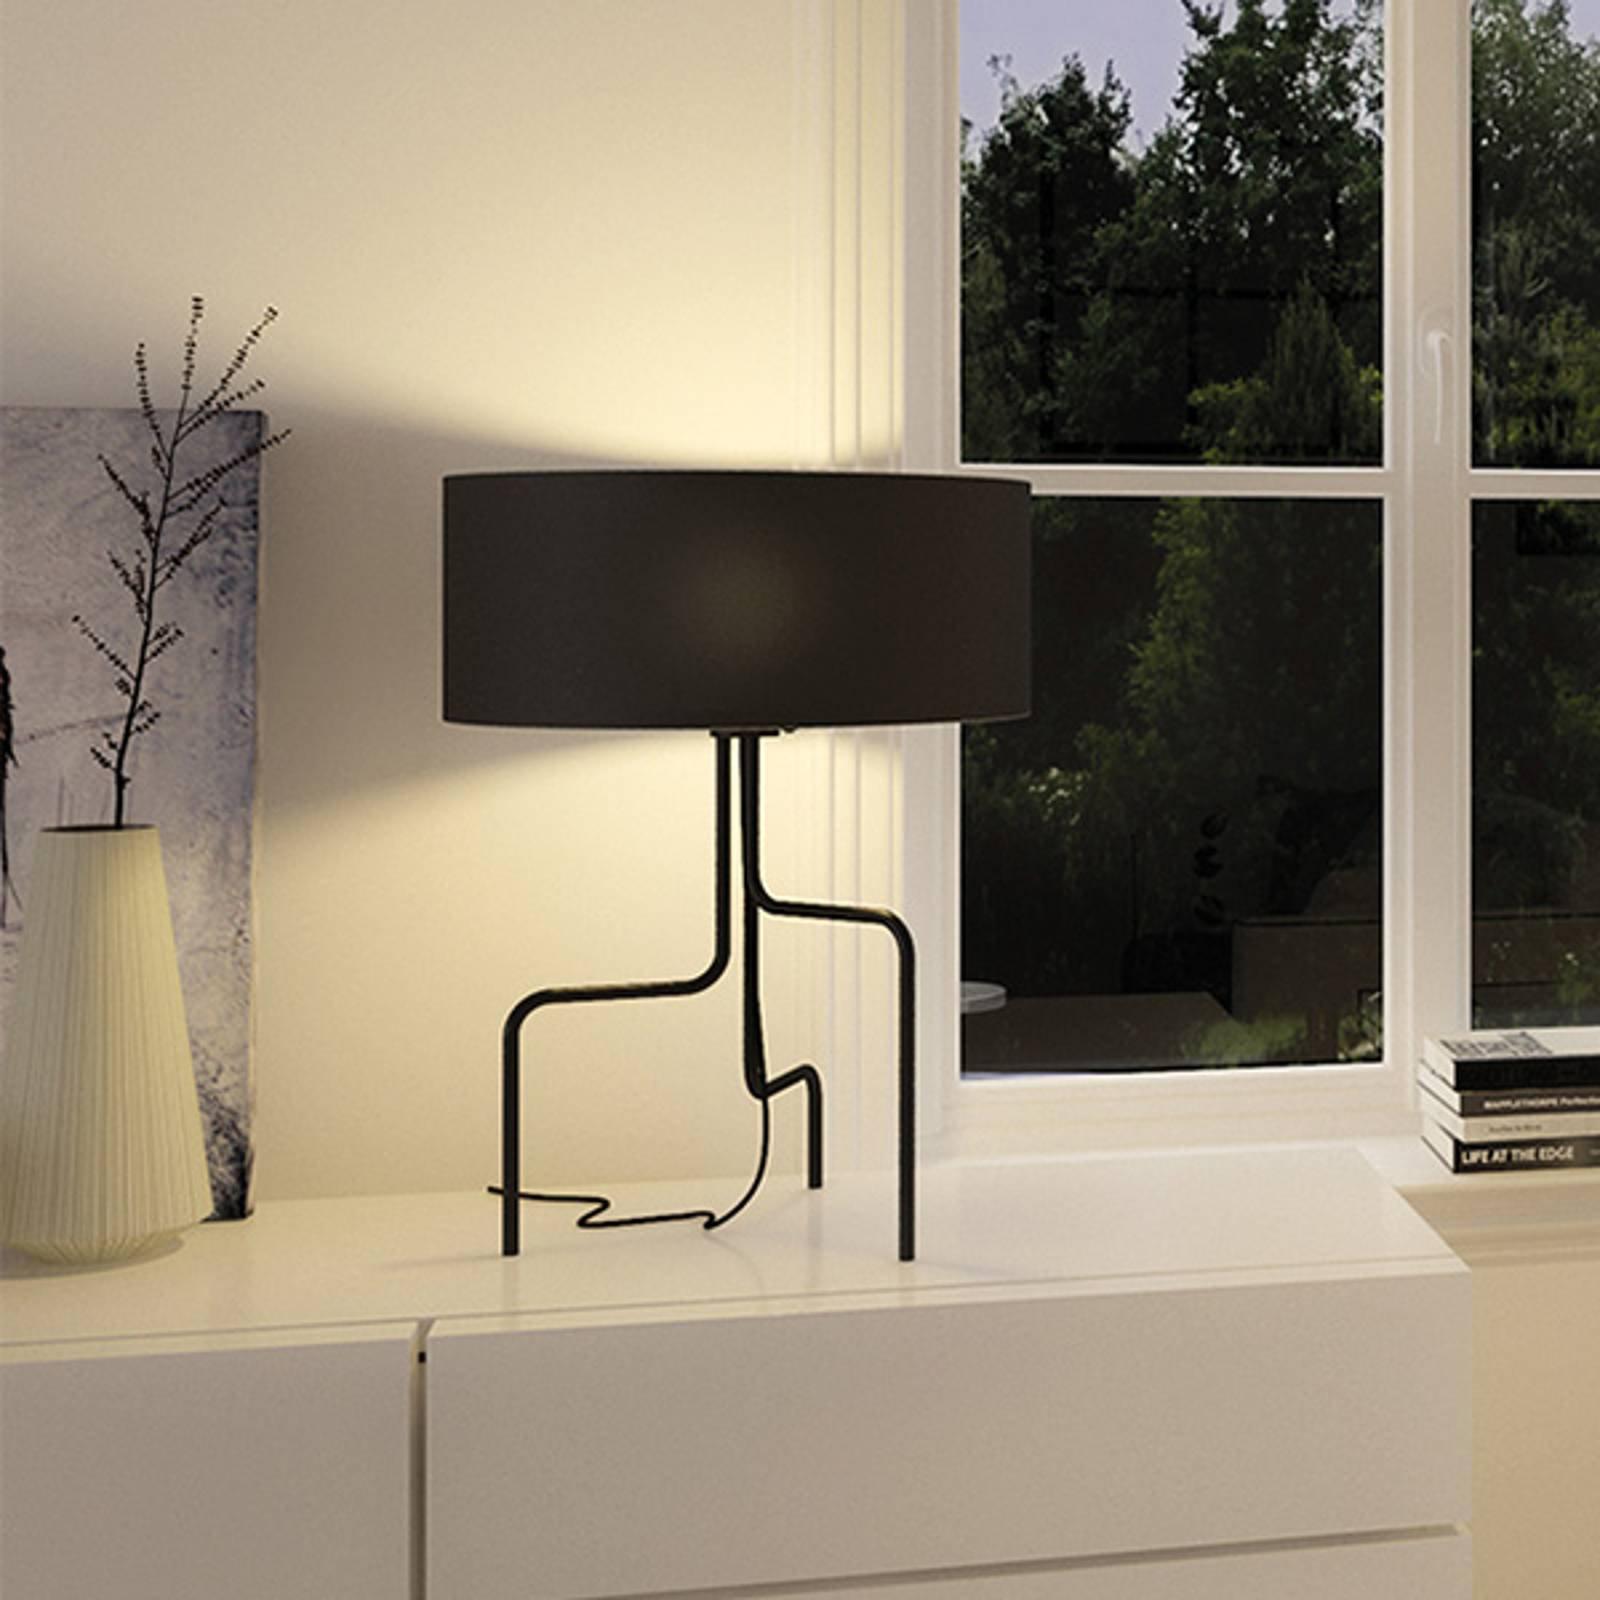 Tekstil-bordlampe Borneo, svart, tre bein